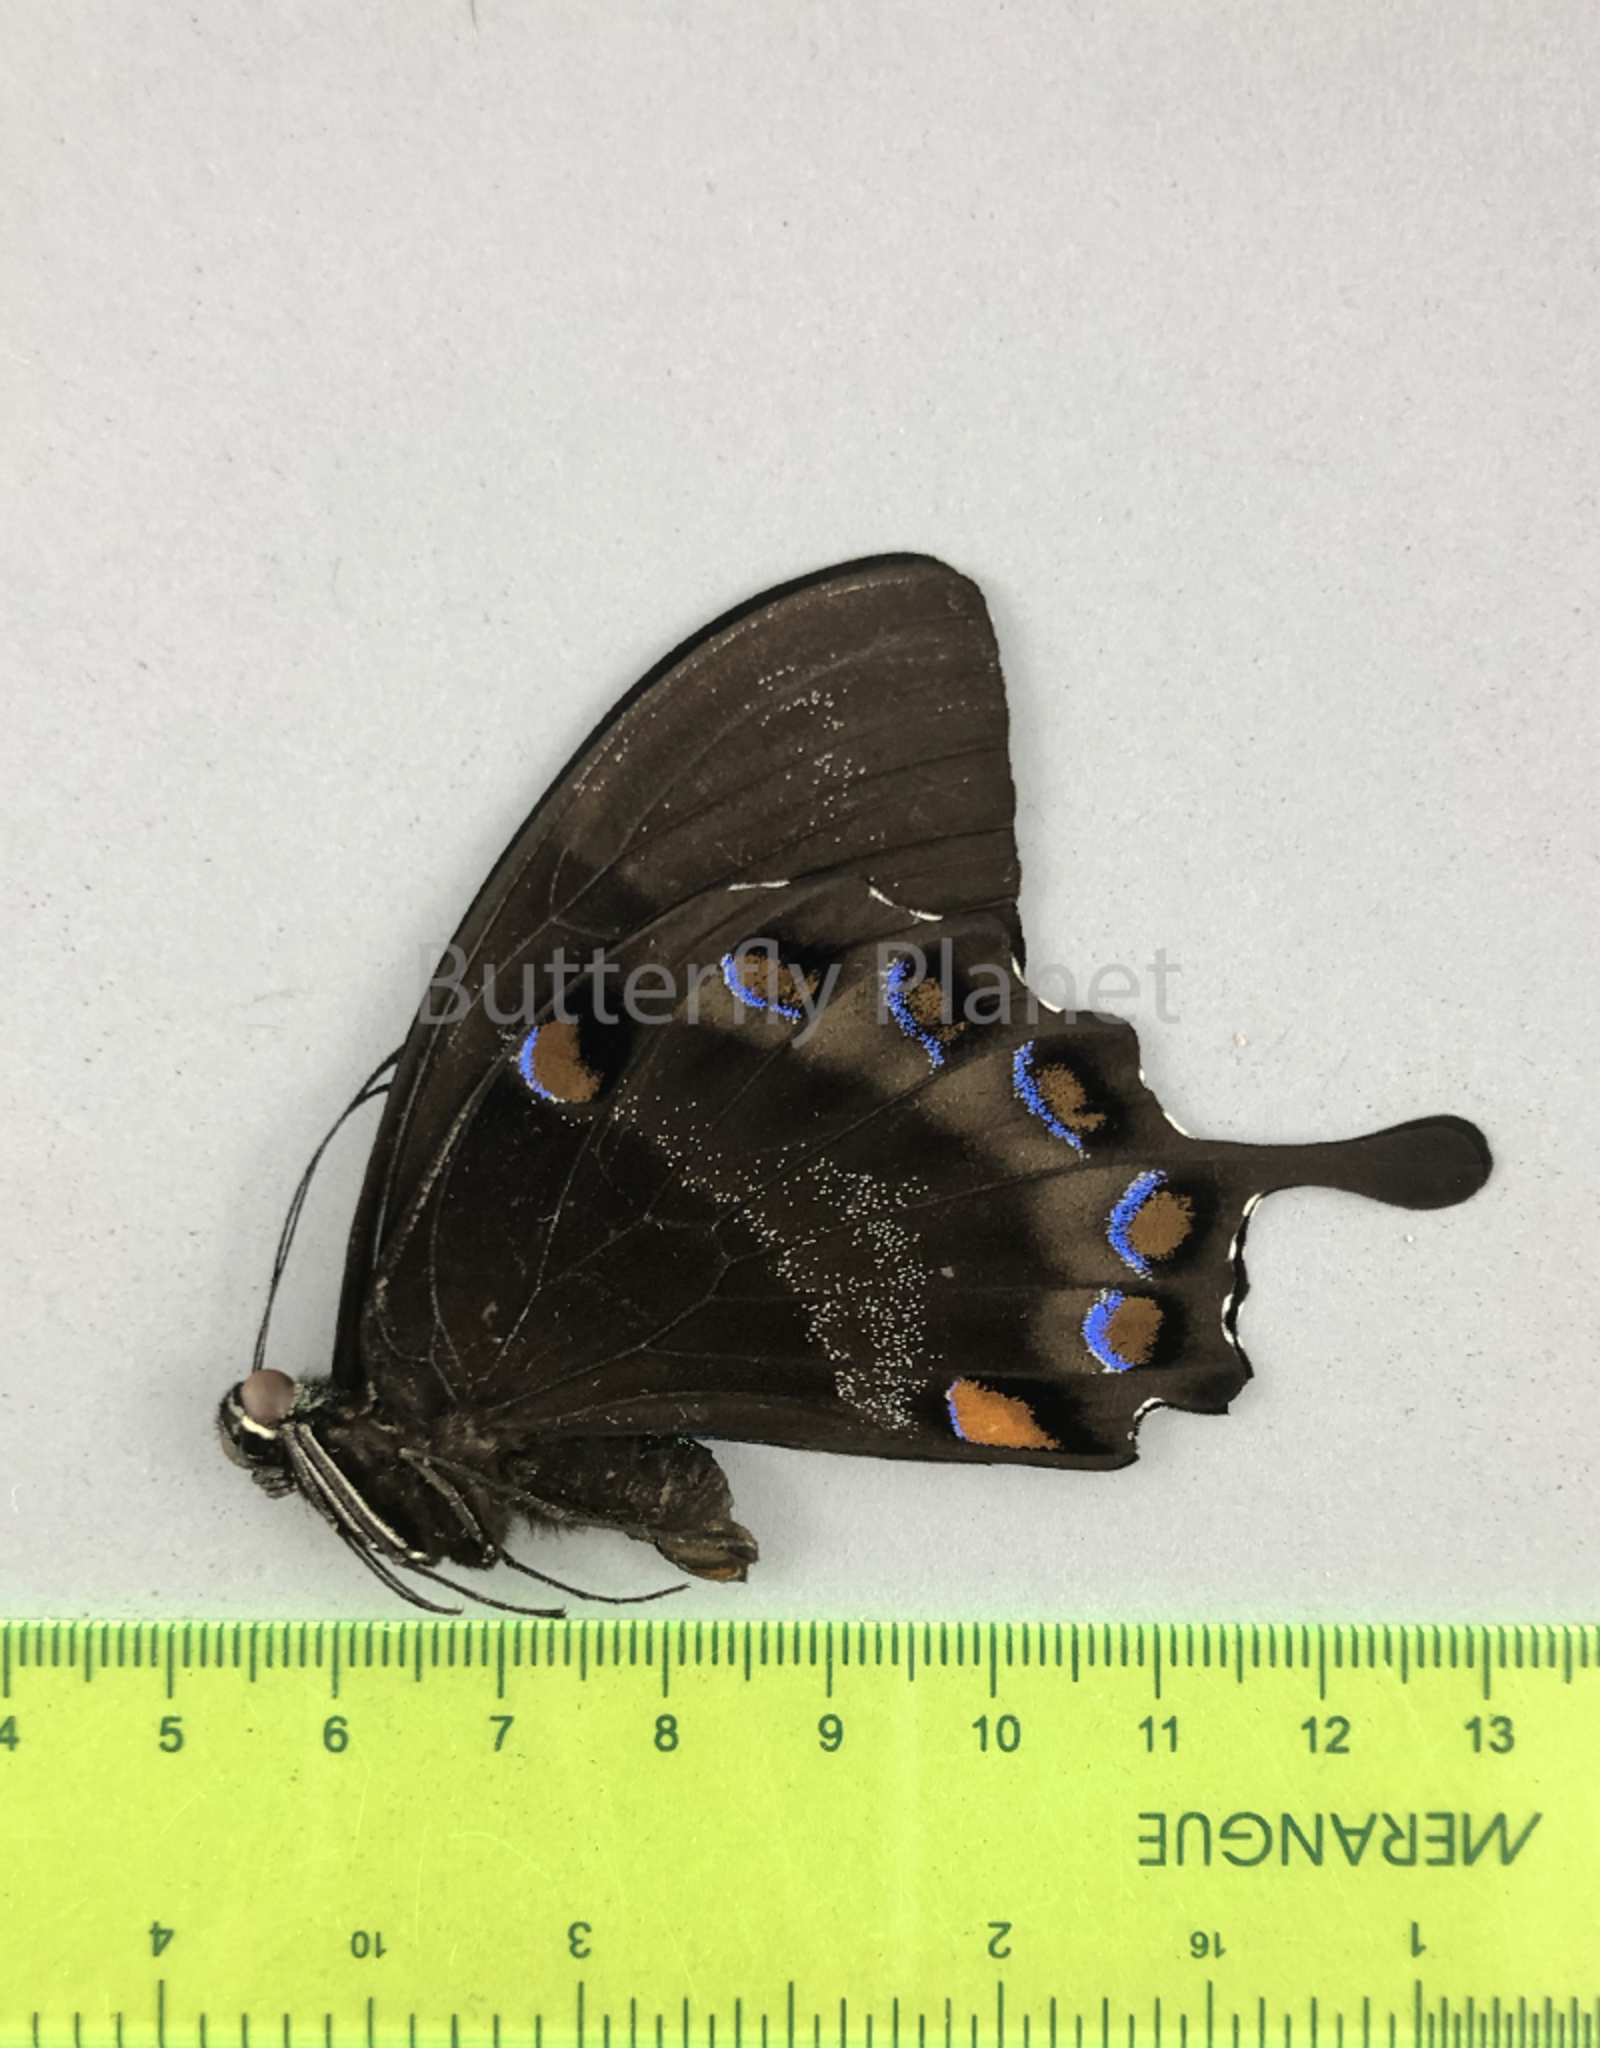 Papilio ulysses nigerrimus M A1 S. Bougainville, PNG